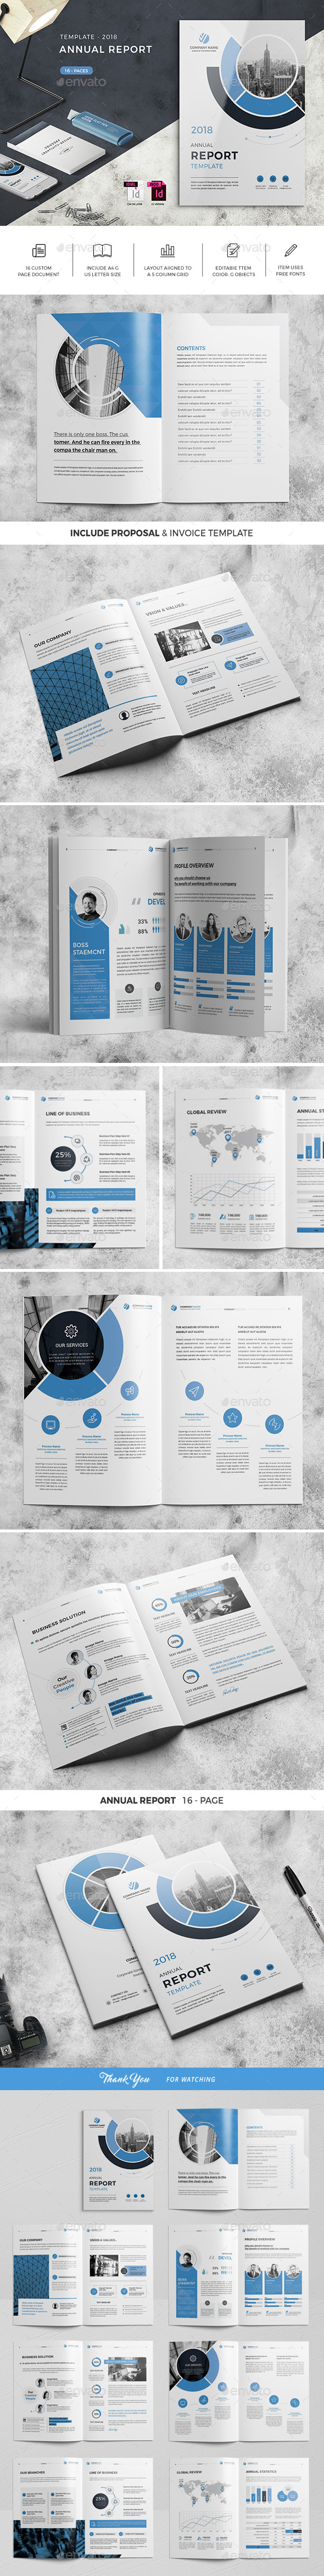 Annual Report Template 02 - Corporate Brochures